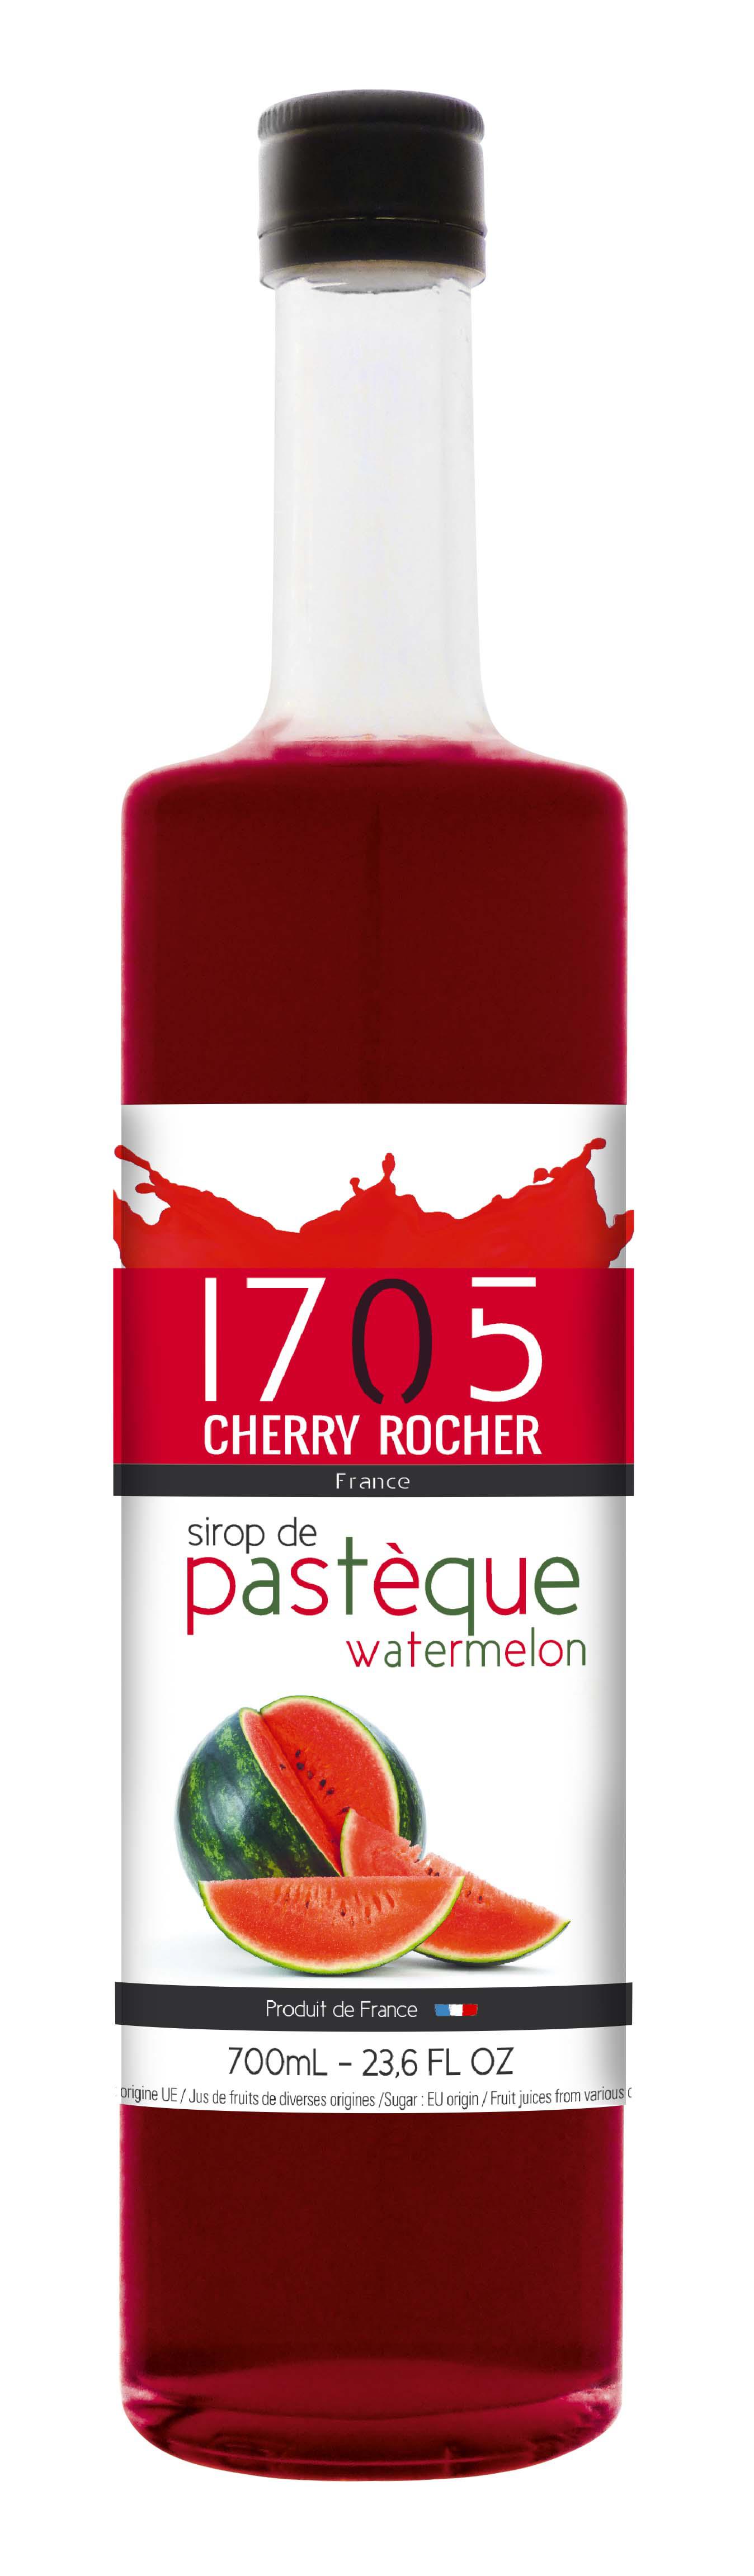 Watermelon syrup - Cherry Rocher